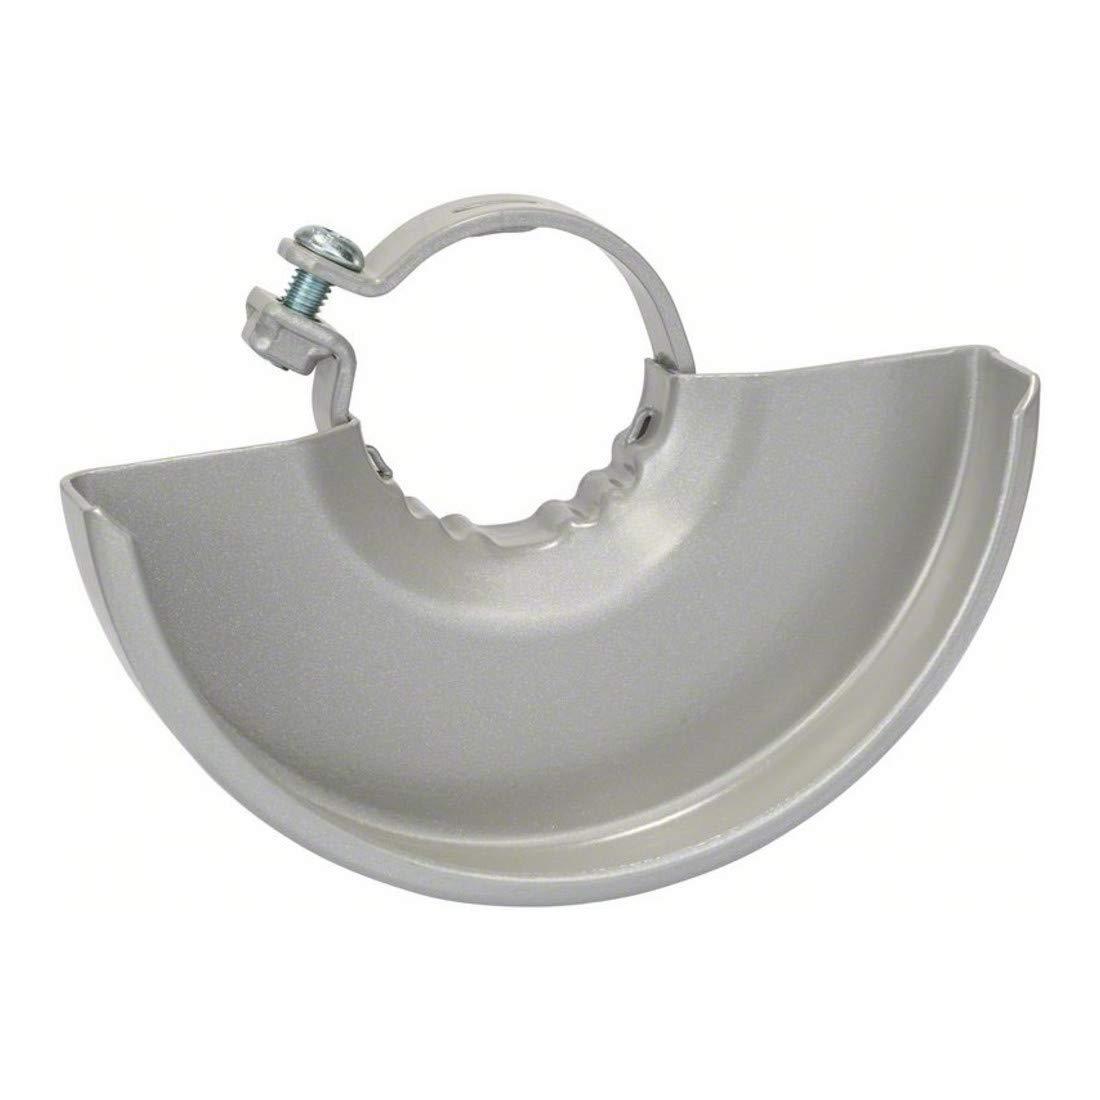 Bosch 1 619 P06 547 - Cubierta protectora para lijar, 115 mm, pack de 1 1619P06547